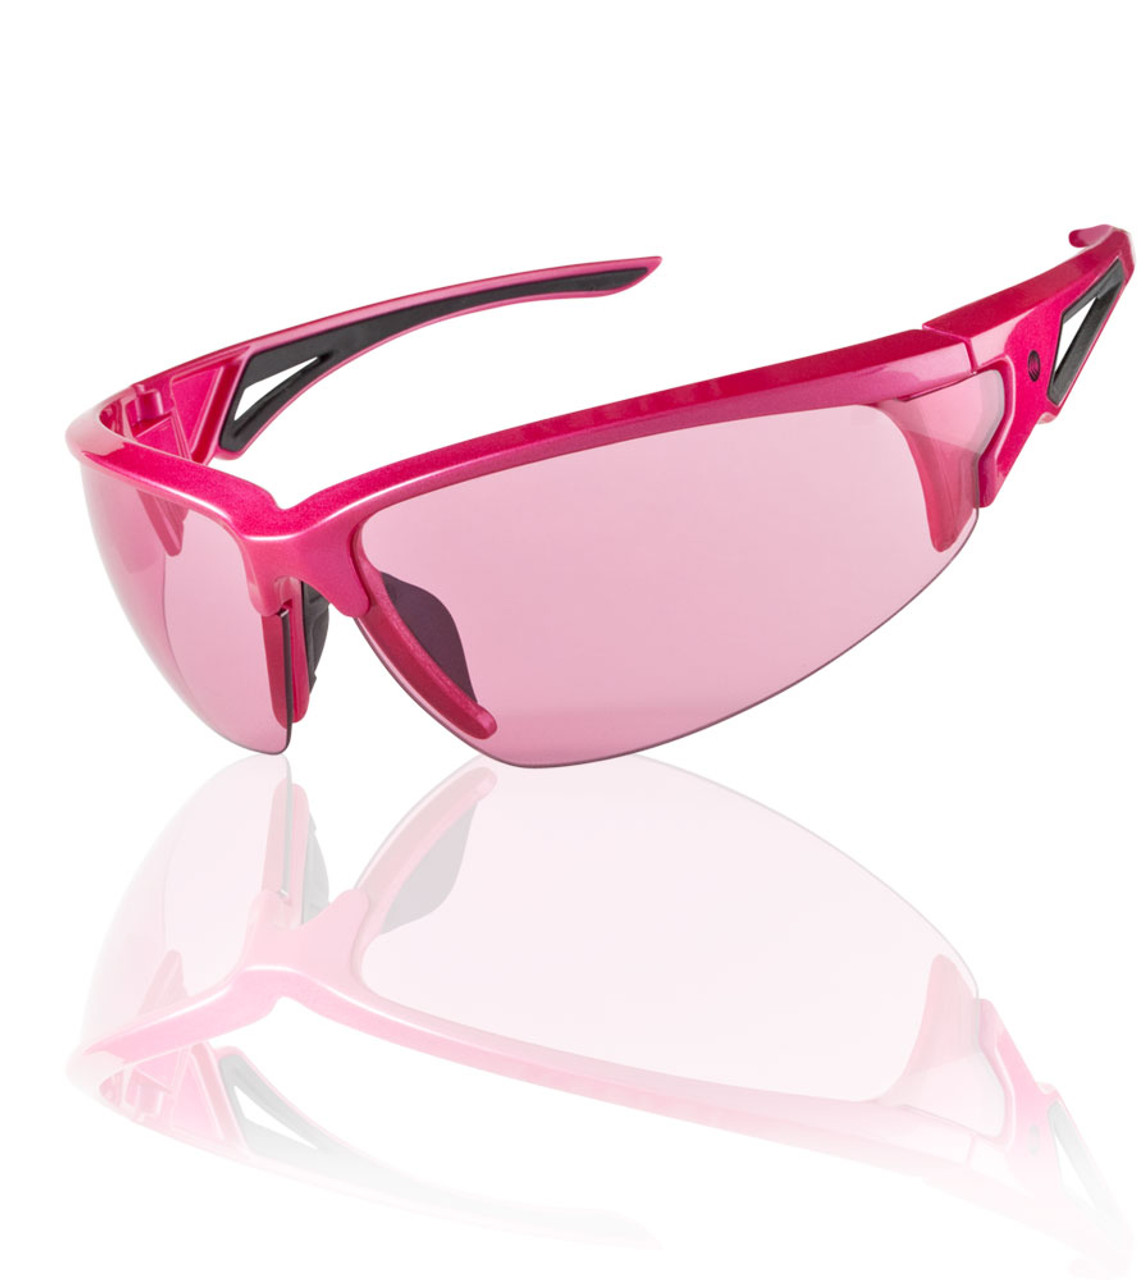 0cf56fb99800 Aero Tech Rose Colored Wrap Sunglasses Ultraviolet Protection